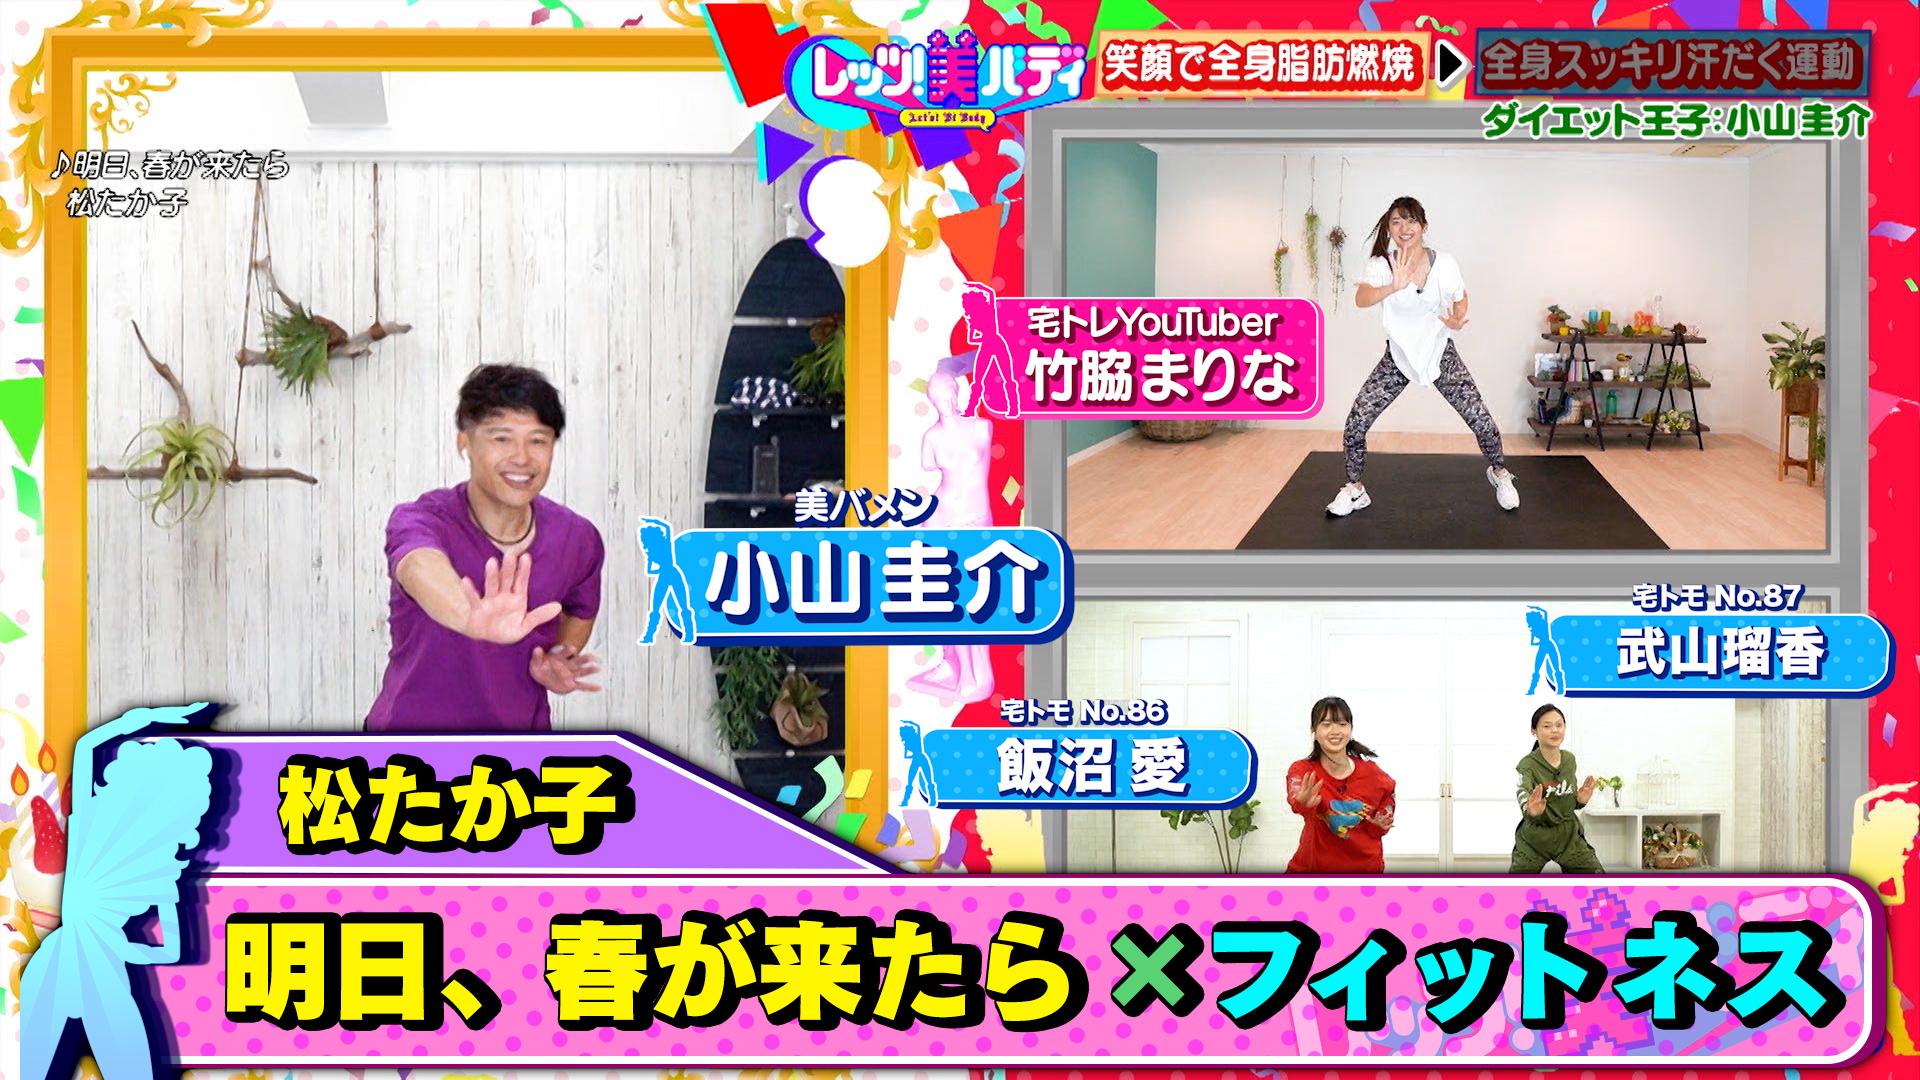 Let's!美バディ #211 竹脇まりな&飯沼愛4